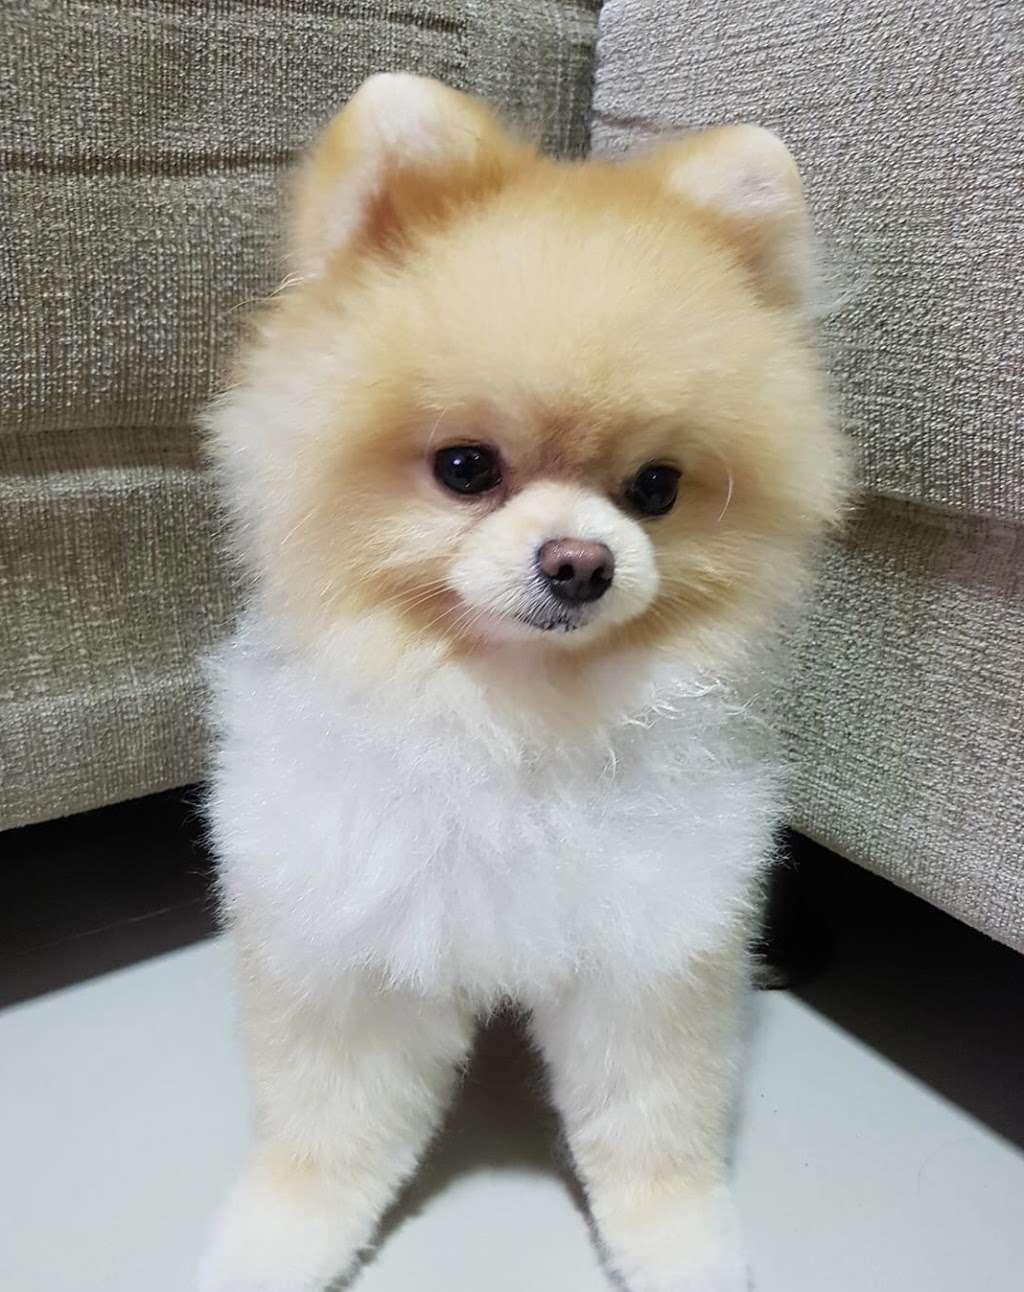 Pomeranian Puppies, Boutique - pet store  | Photo 3 of 10 | Address: Houston, TX, USA | Phone: (650) 303-1599